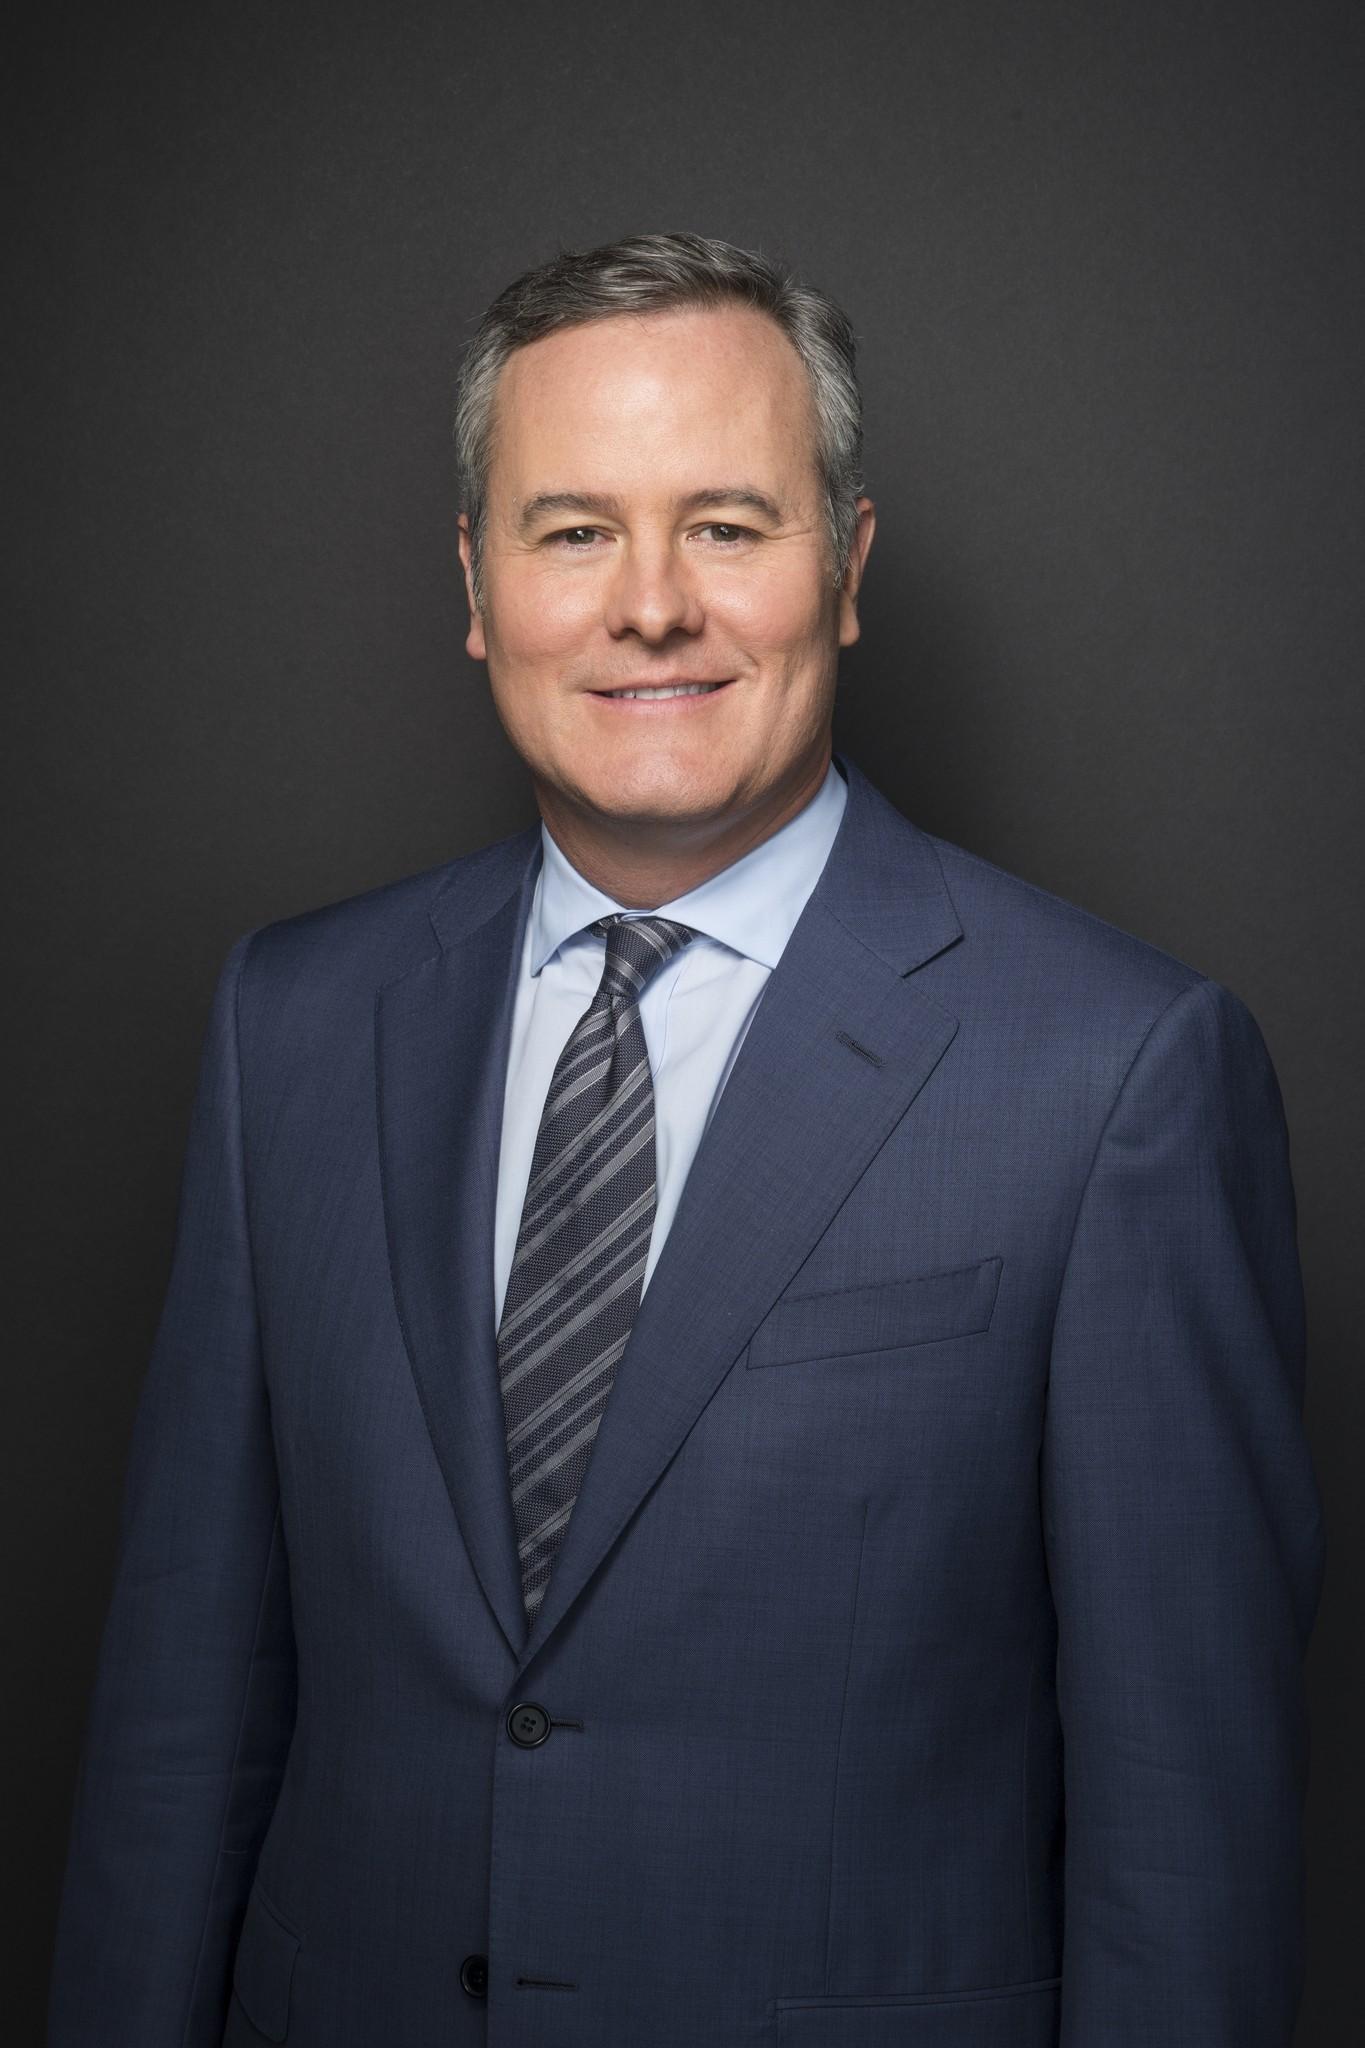 patrick dwyer top ranked financial advisor sun sentinel